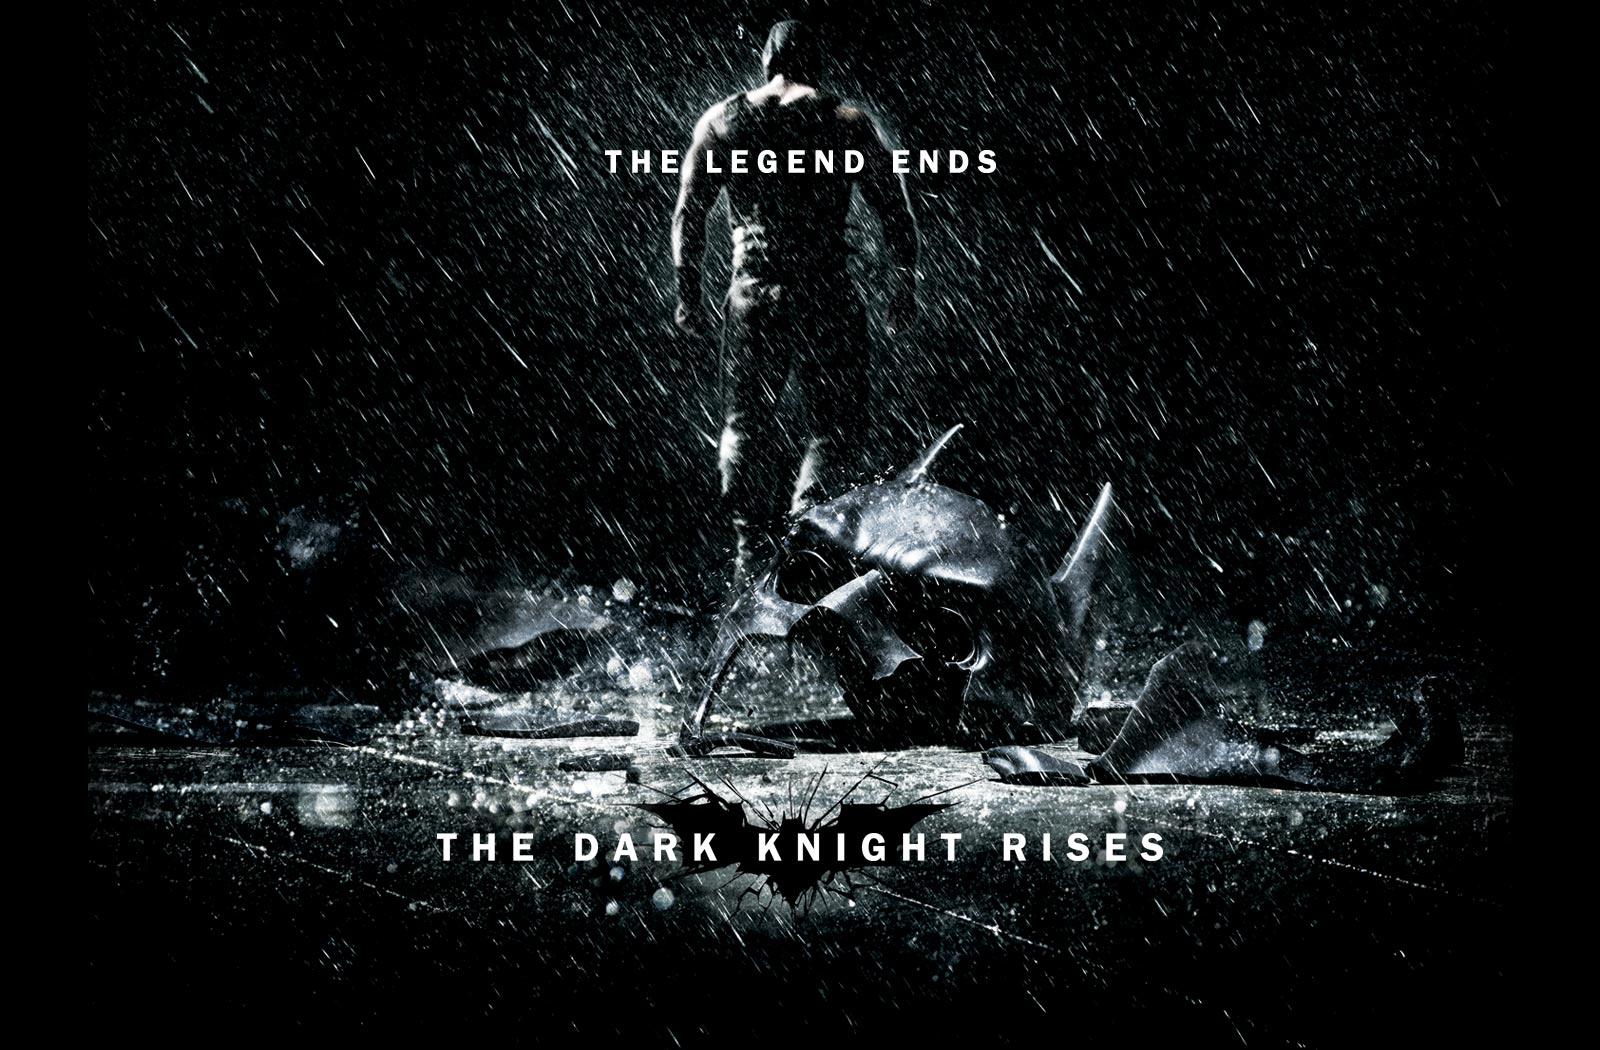 bane dark knight rises wallpapers - The Dark Knight Rises Bane HD desktop wallpaper High